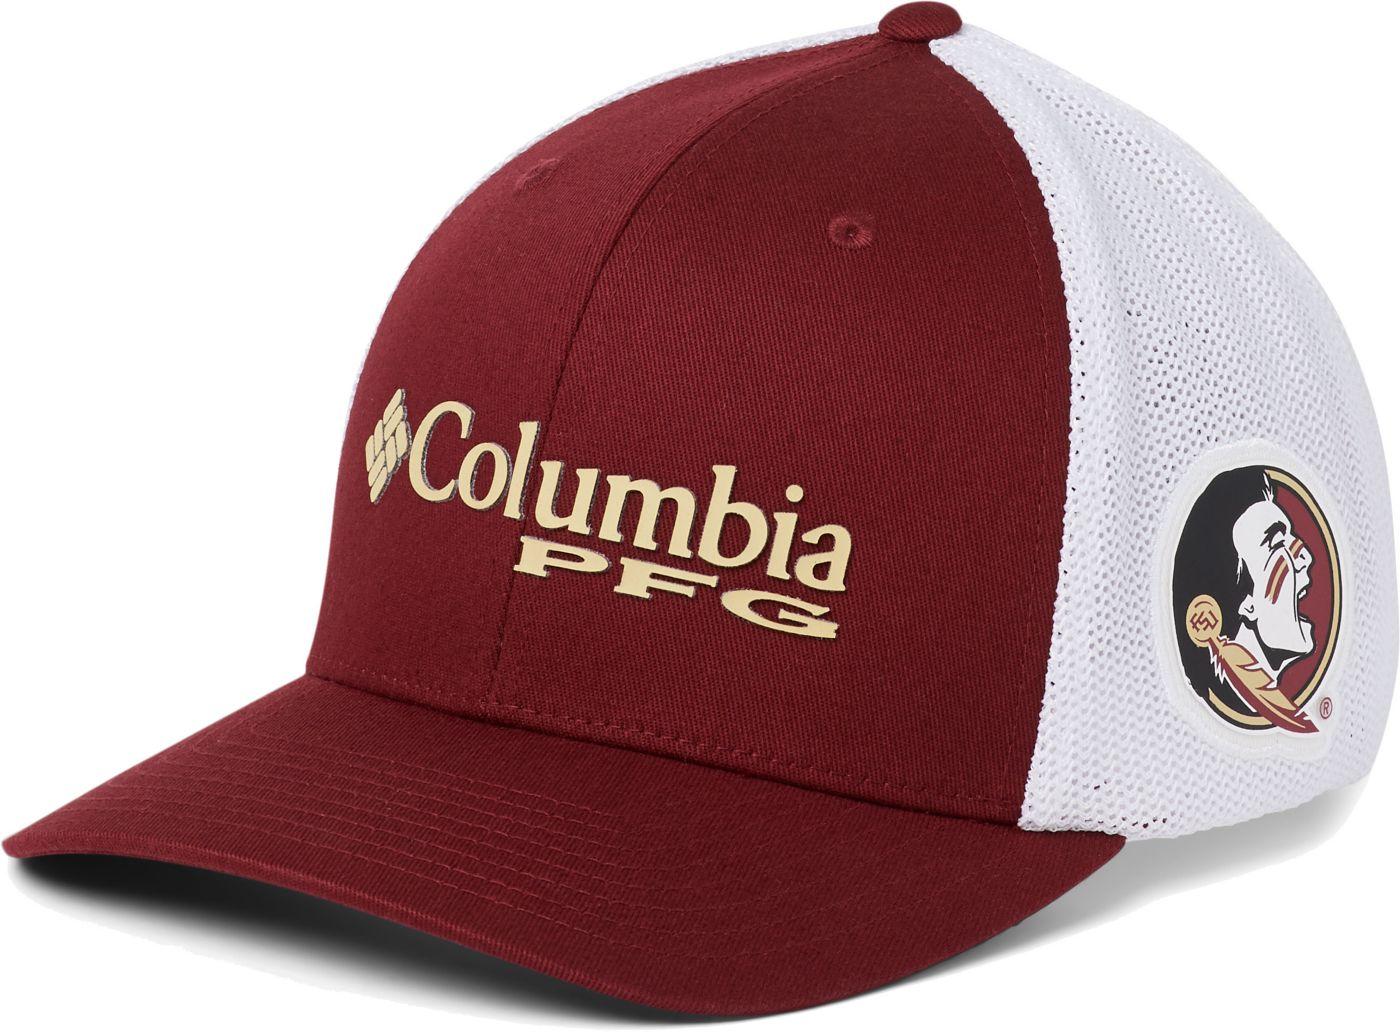 Columbia Men's Florida State Seminoles Garnet PFG Mesh Fitted Hat